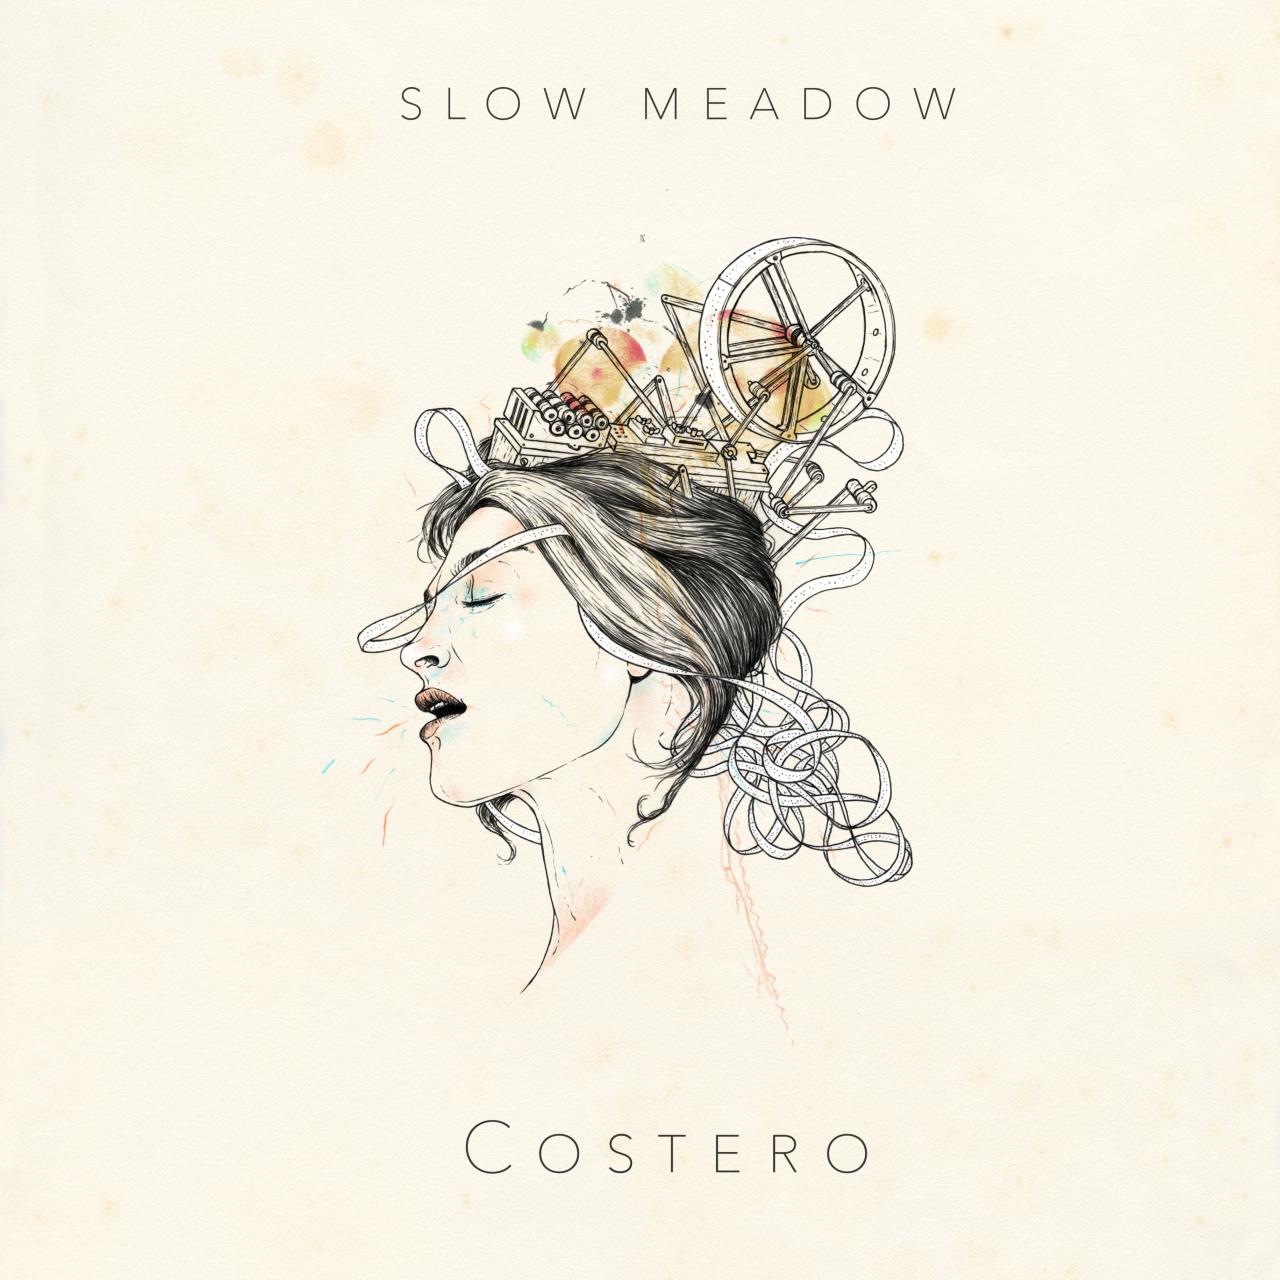 Slow Meadow ~Costero